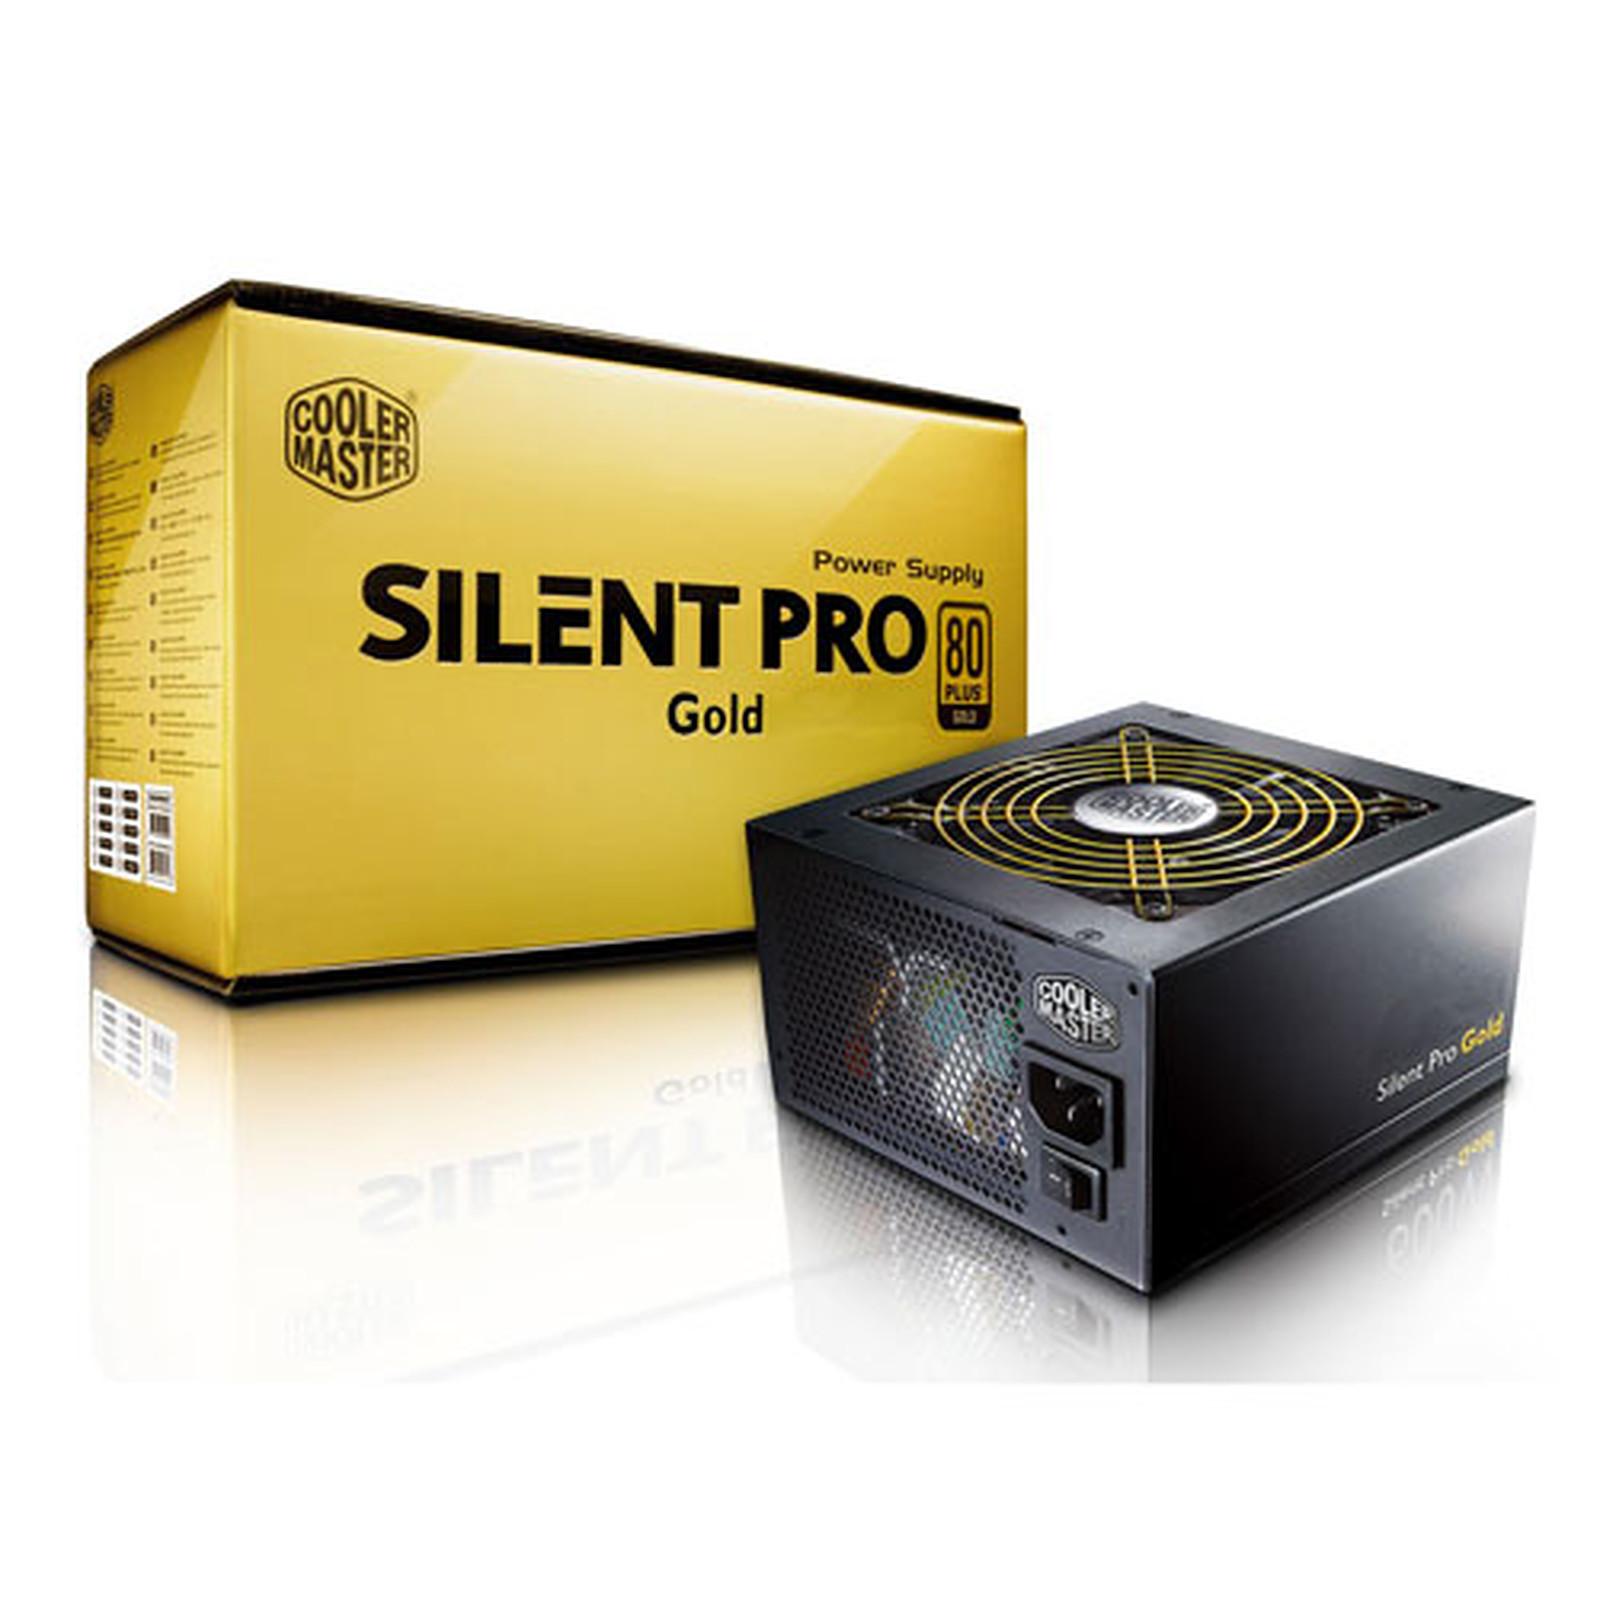 Cooler Master Silent Pro Gold 450W 80PLUS Gold